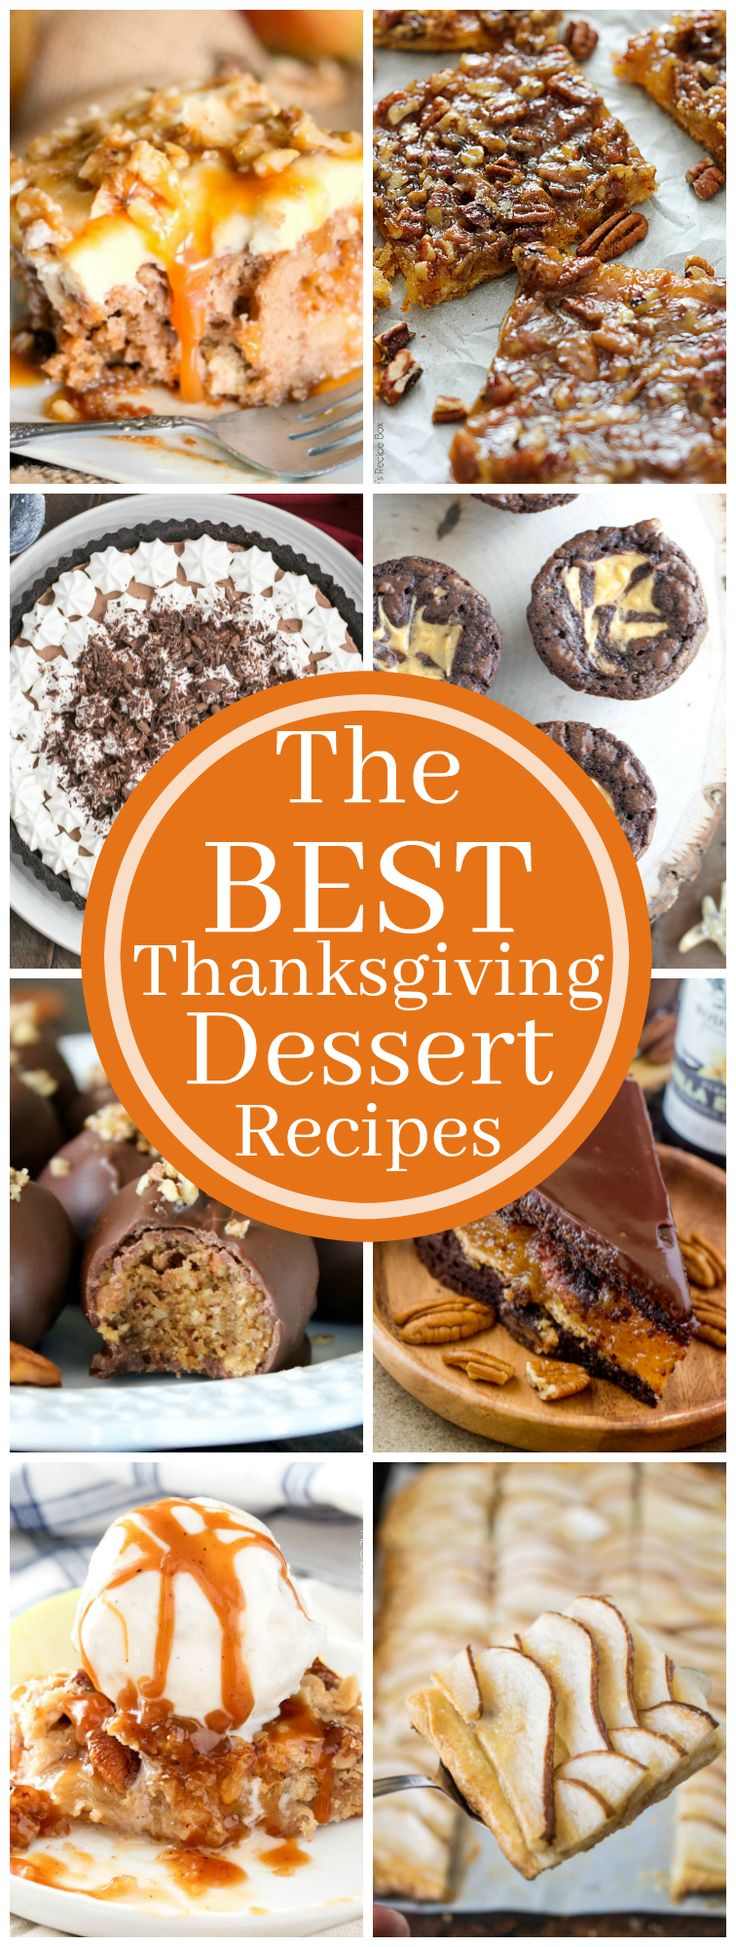 Best Thanksgiving Dessert Recipes - Pecan Pie Truffles